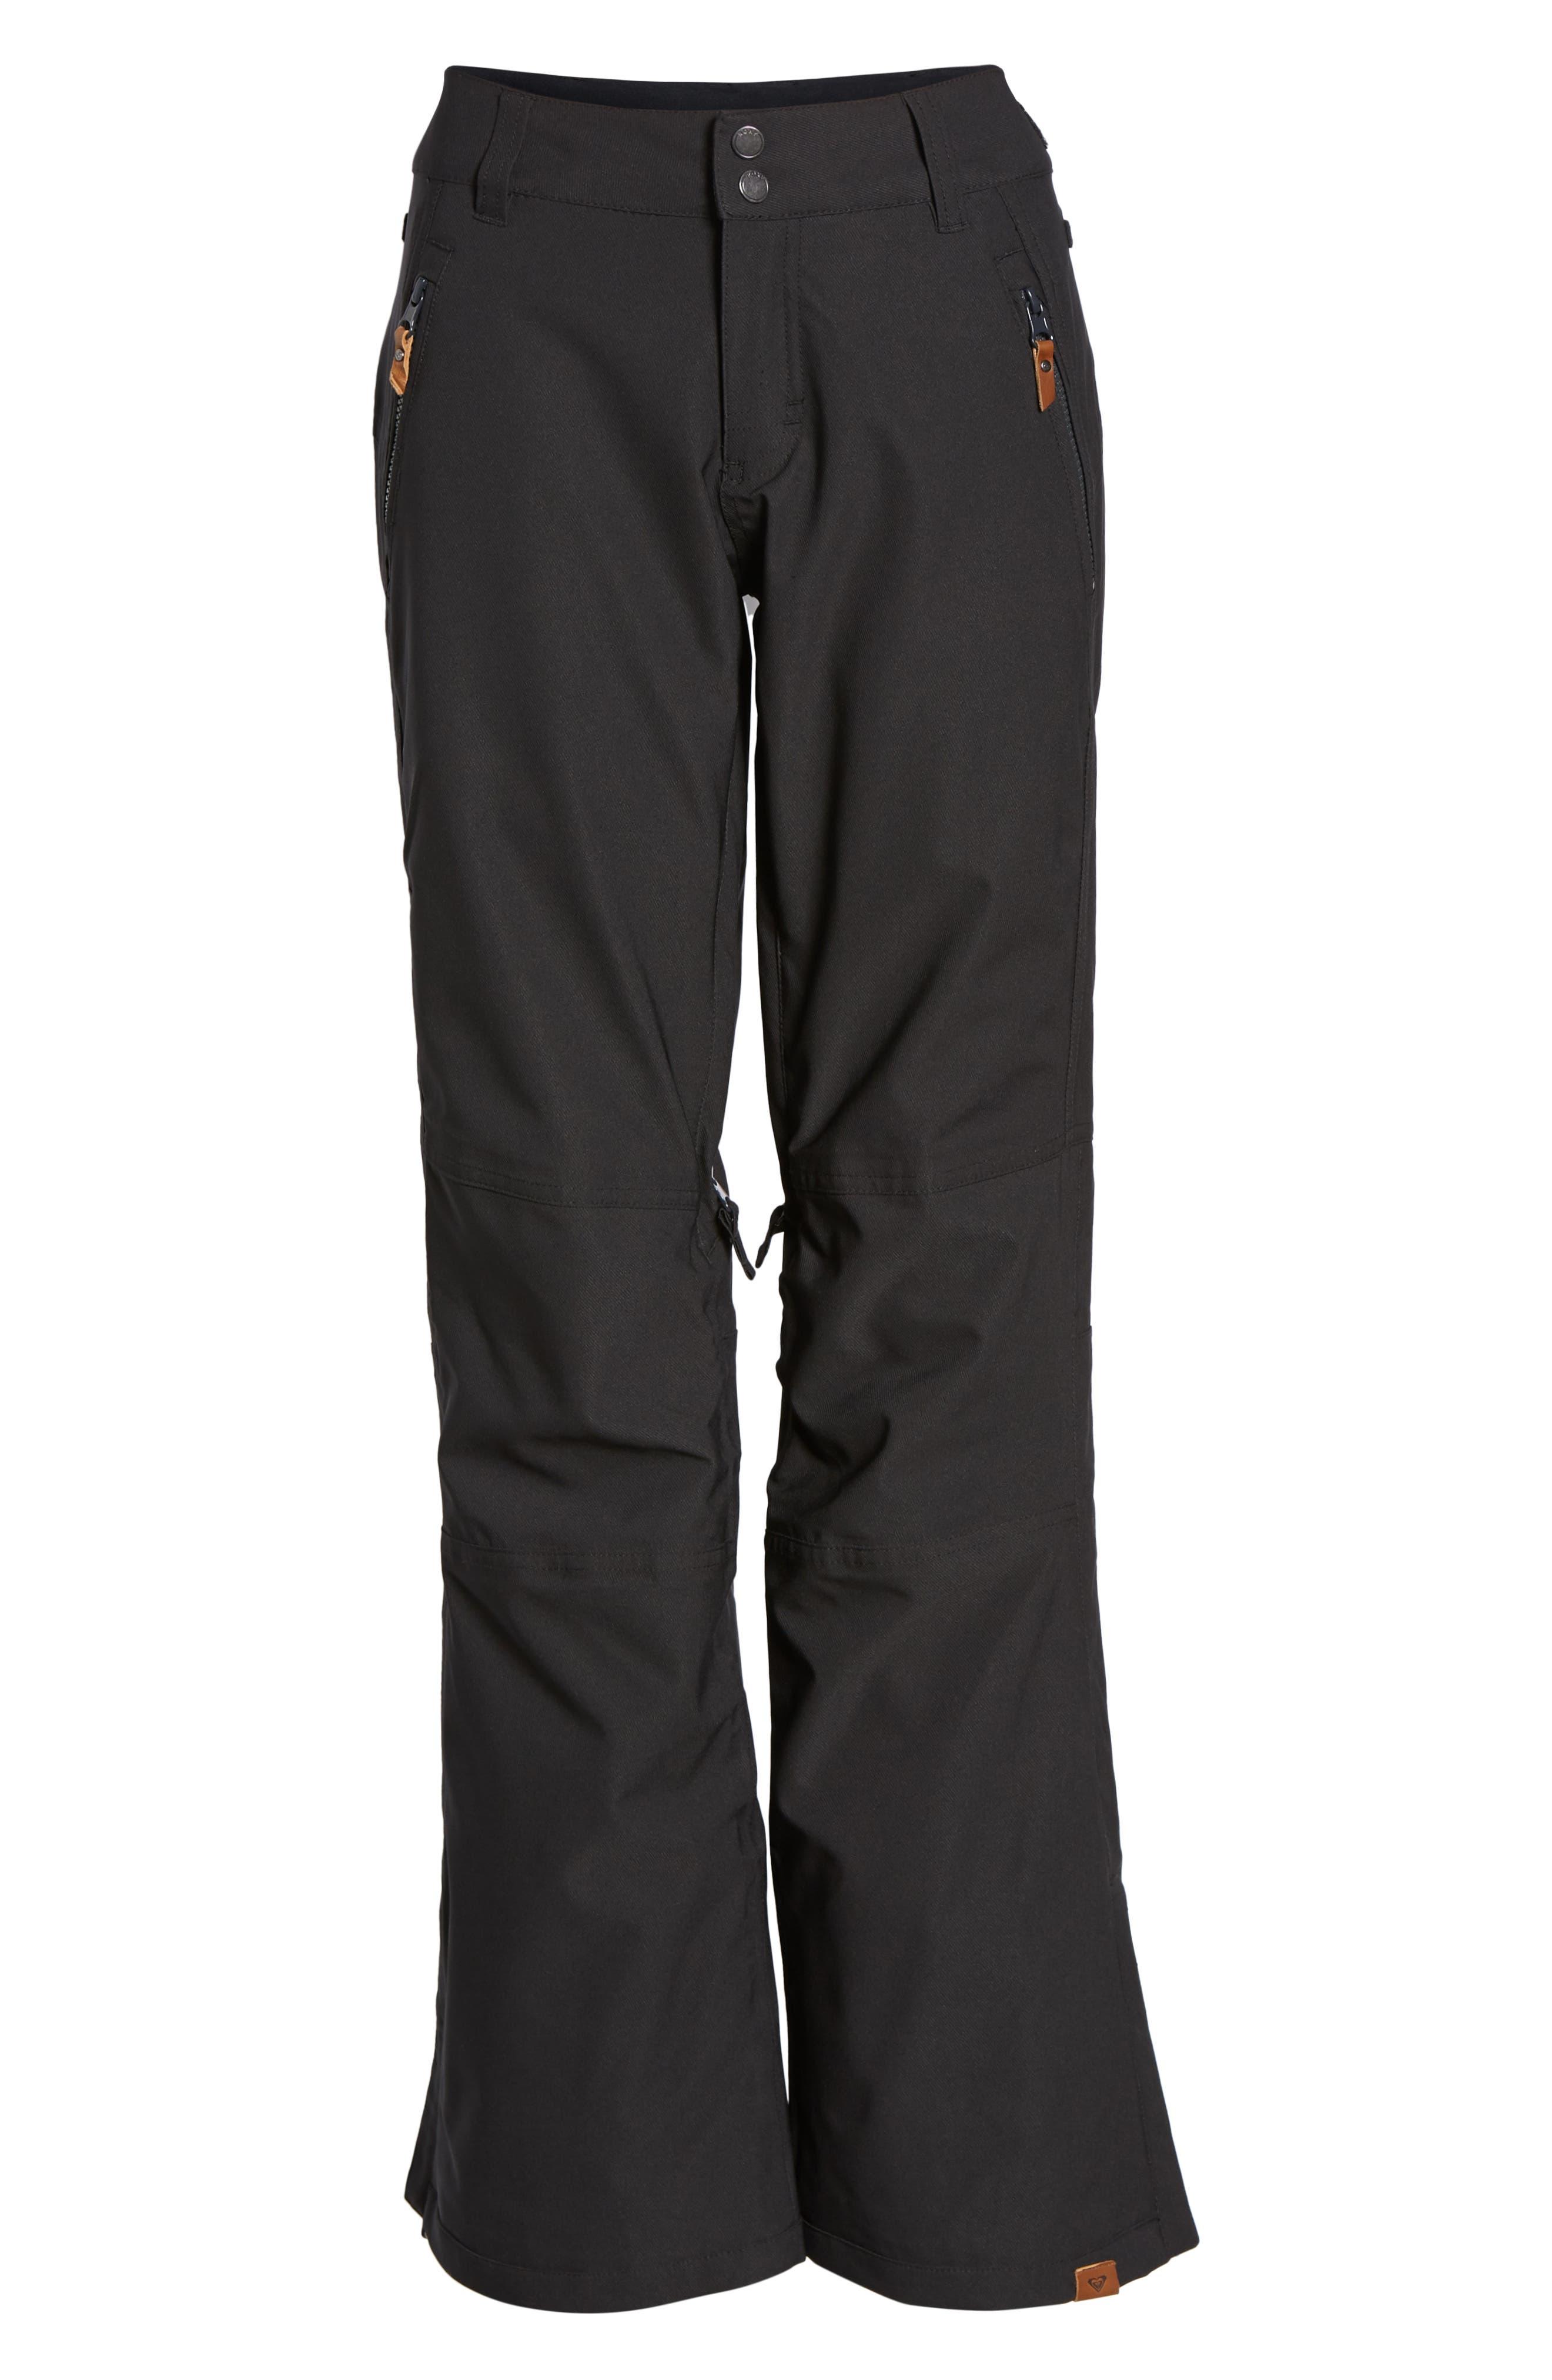 ROXY,                             Cabin Snow Pants,                             Alternate thumbnail 4, color,                             002